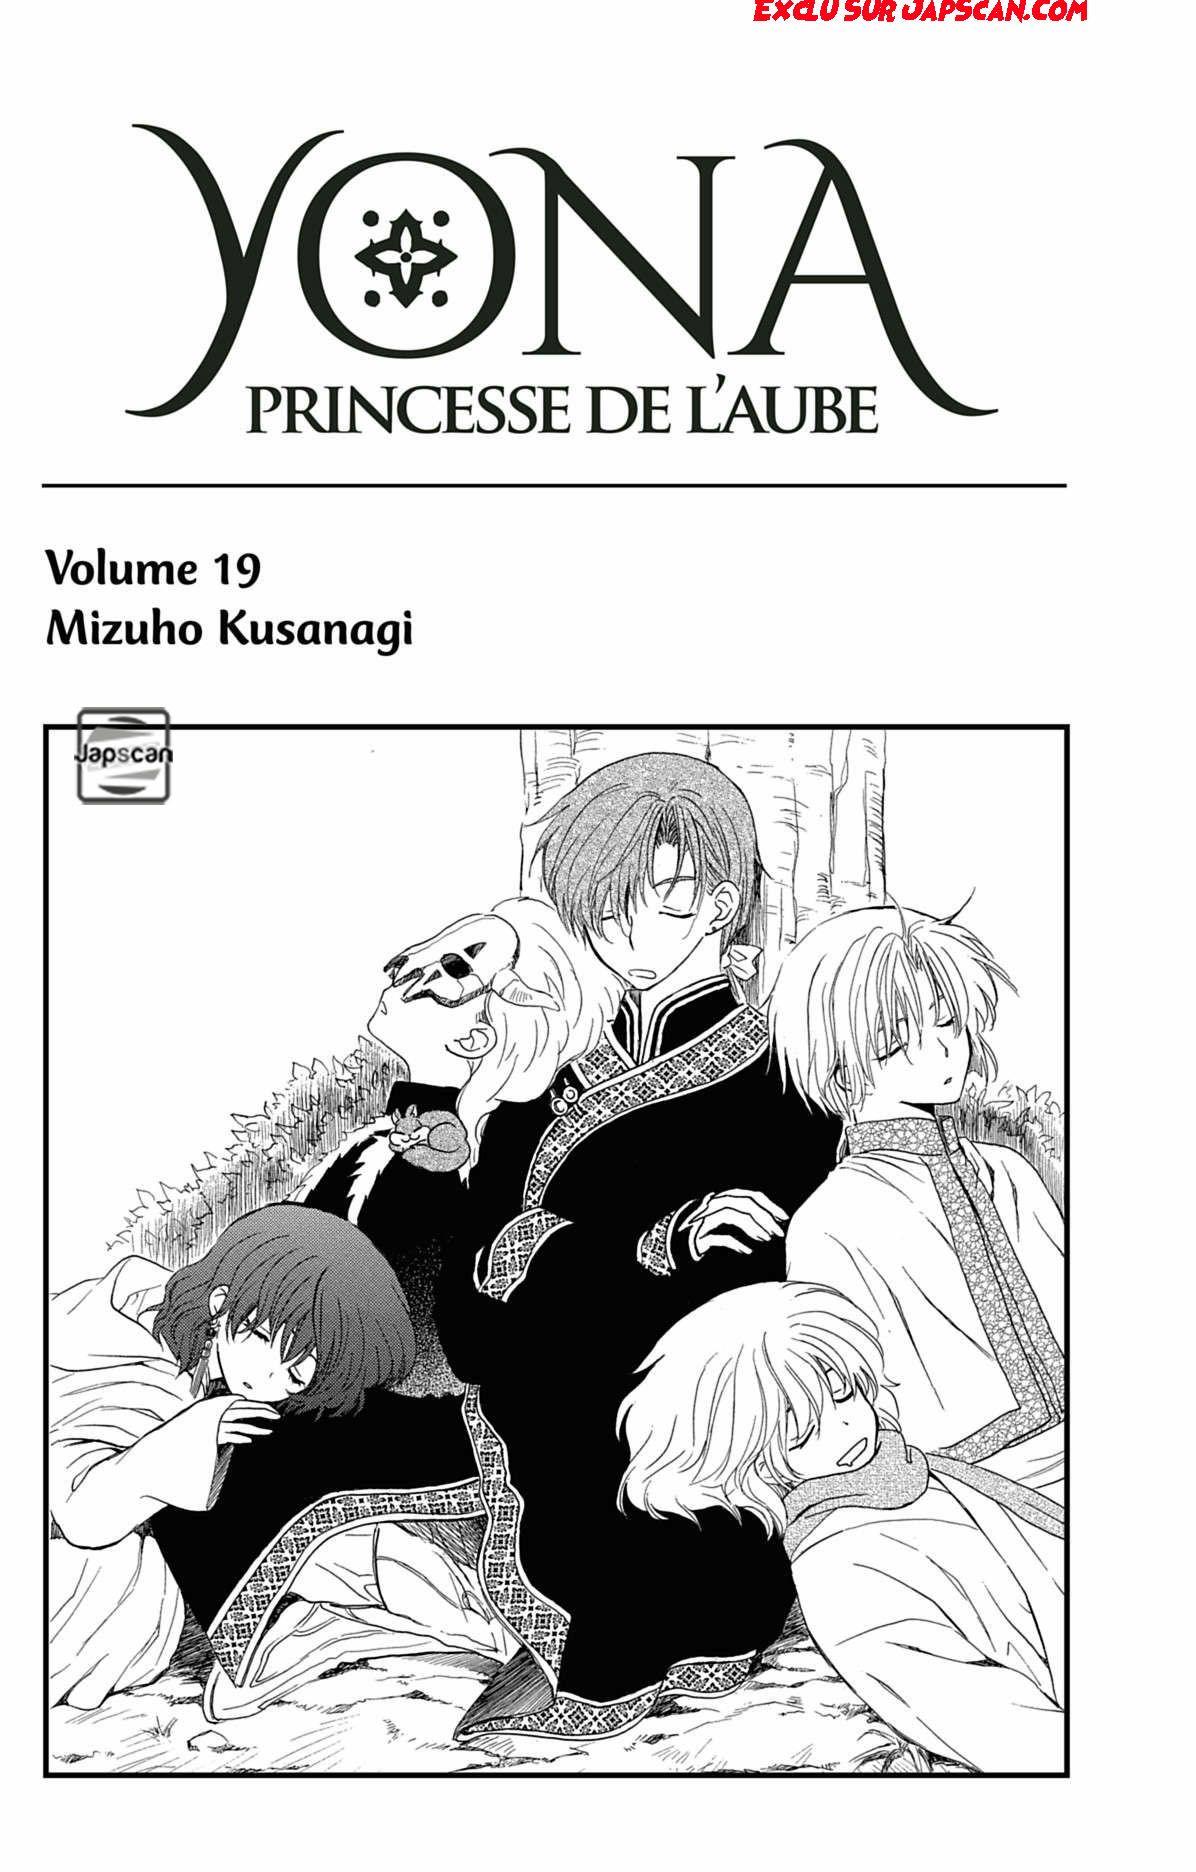 Akatsuki No Yona Scan Fr : akatsuki, Princesse, L'Aube, Akatsuki,, Lecture, Ligne,, Manga, Francais